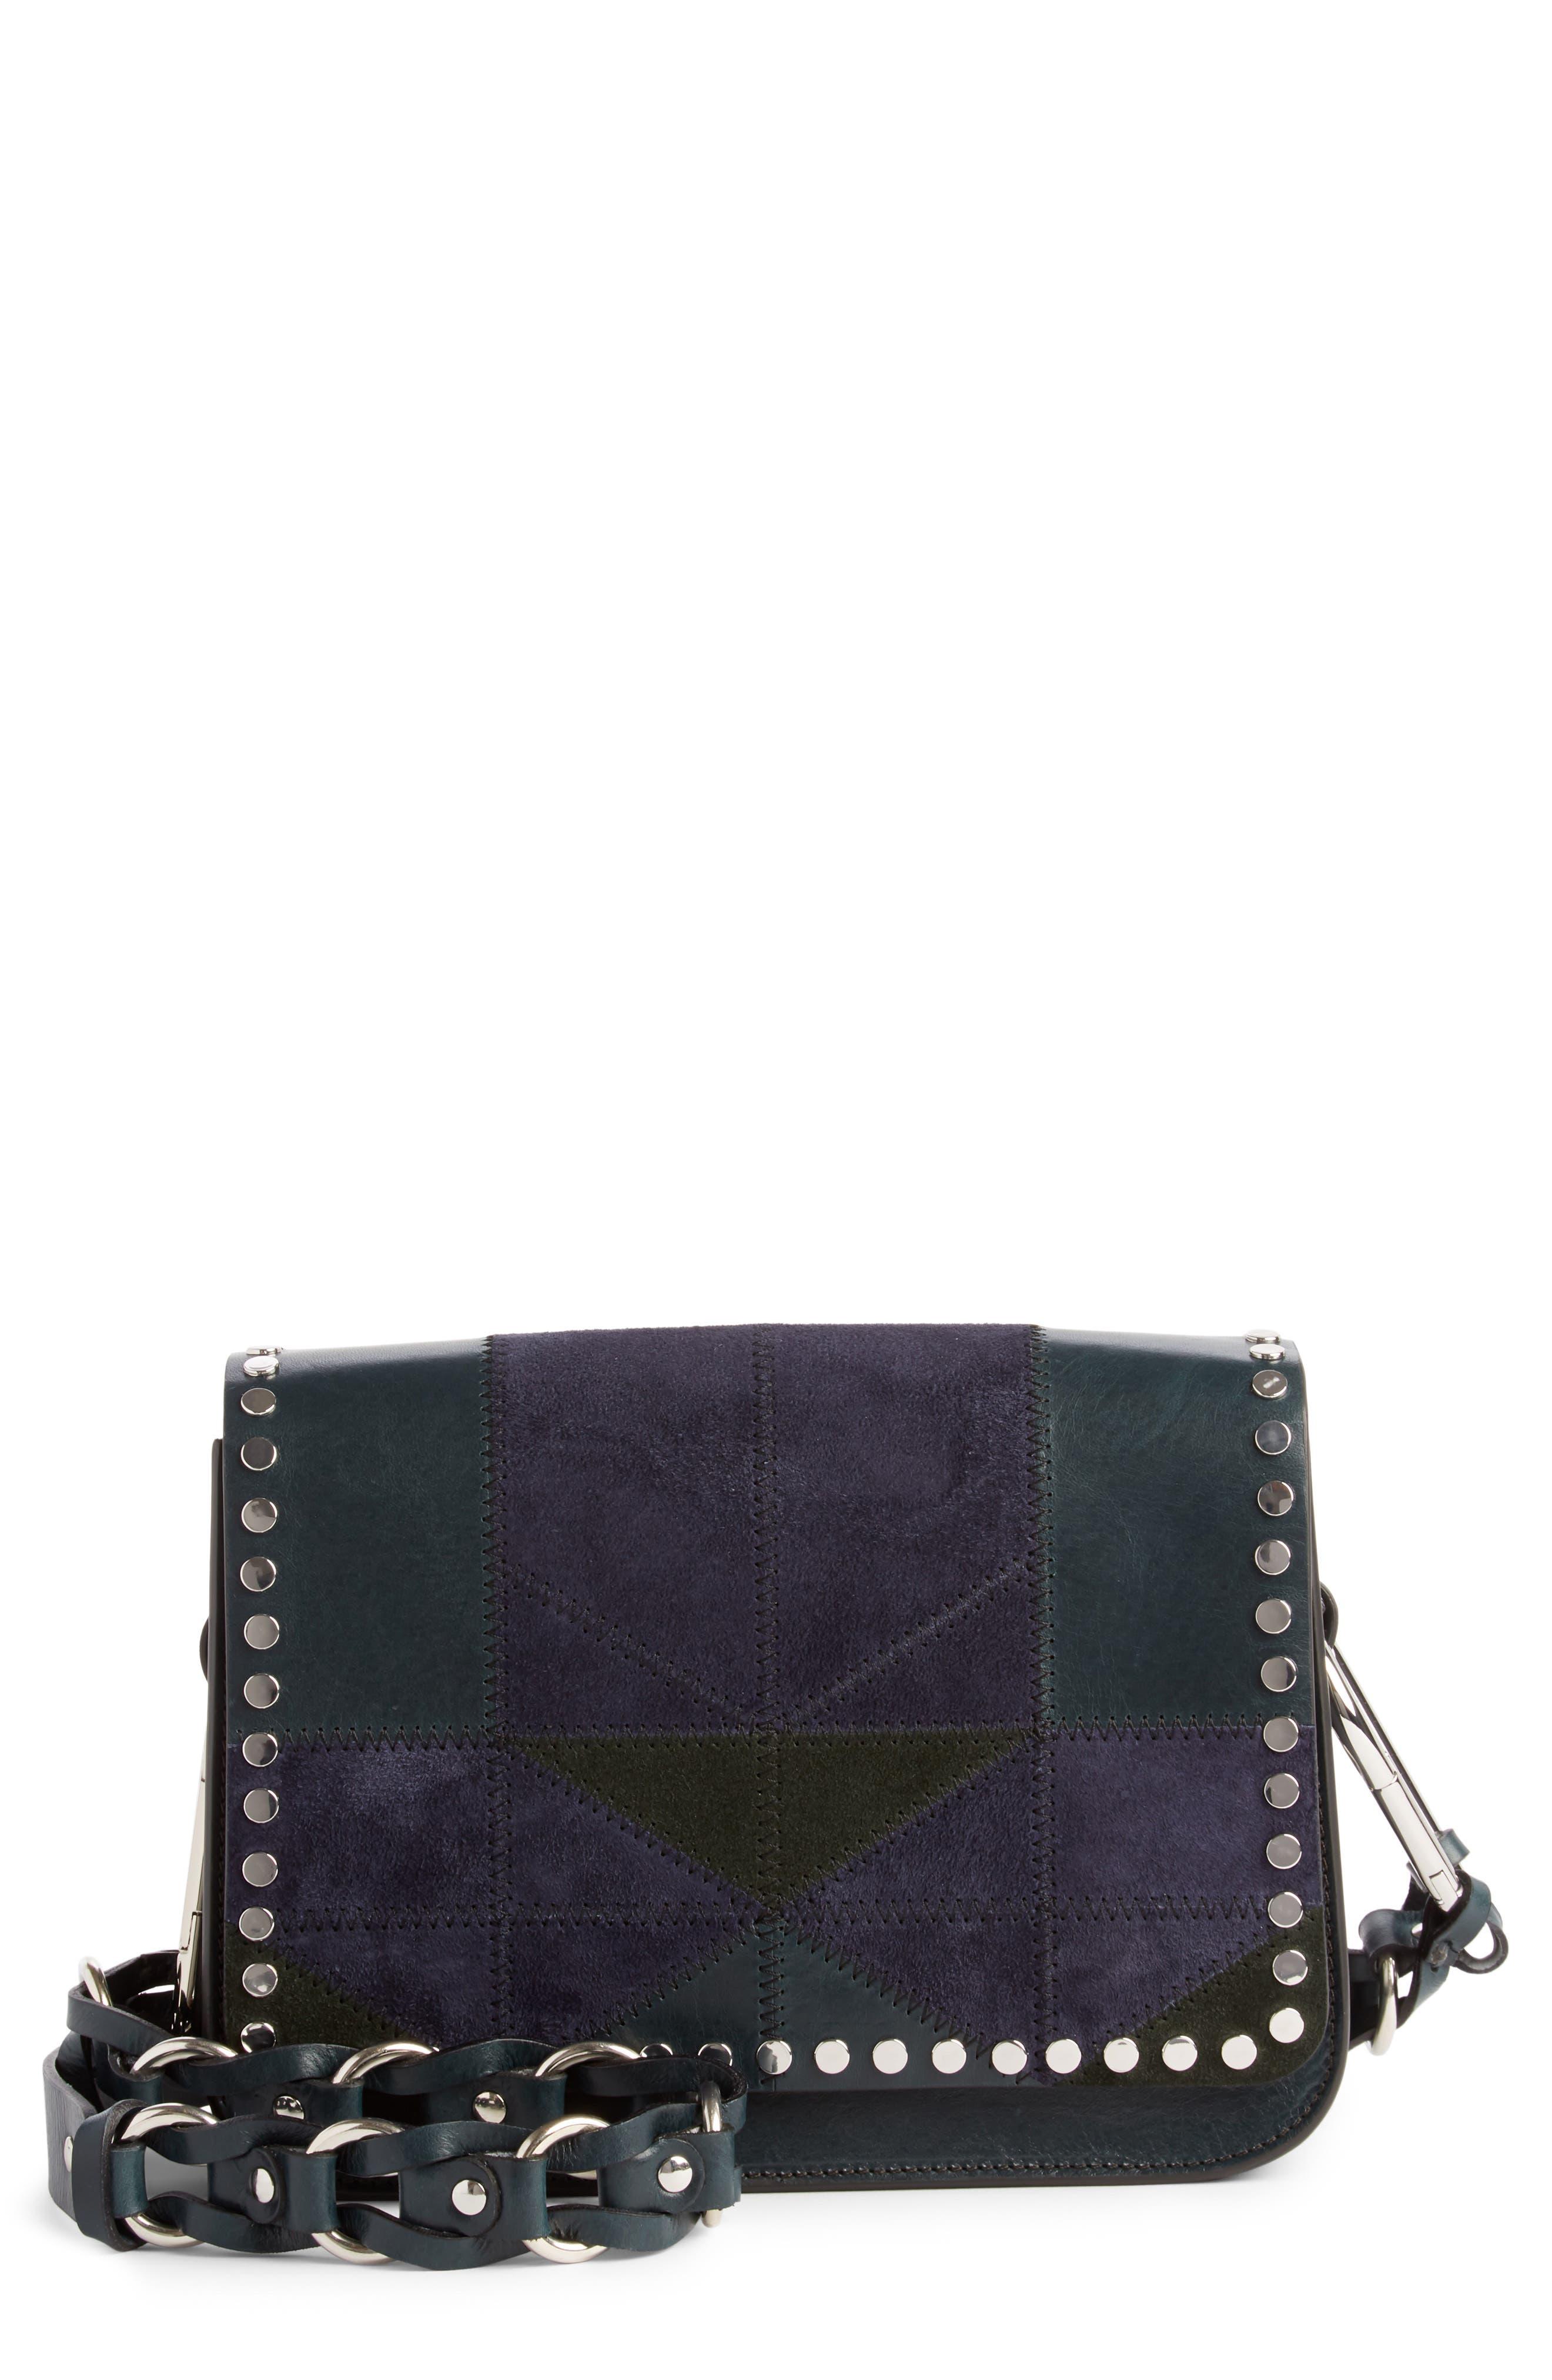 Isabel Marant Calibar Patchwork Leather Crossbody Bag